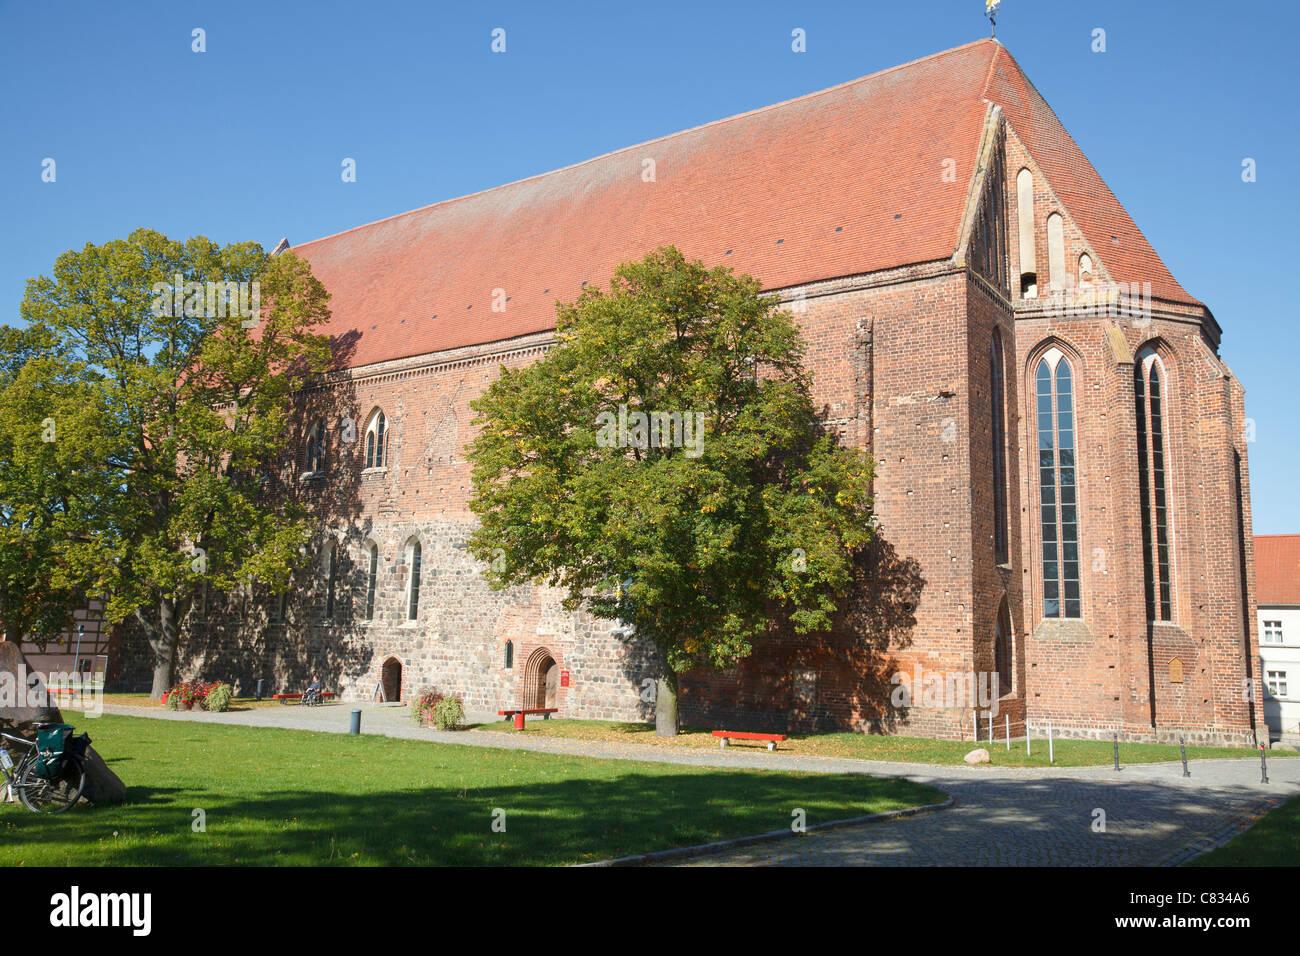 Klosterkirche, Angermuende, Brandenburg, Germany - Stock Image